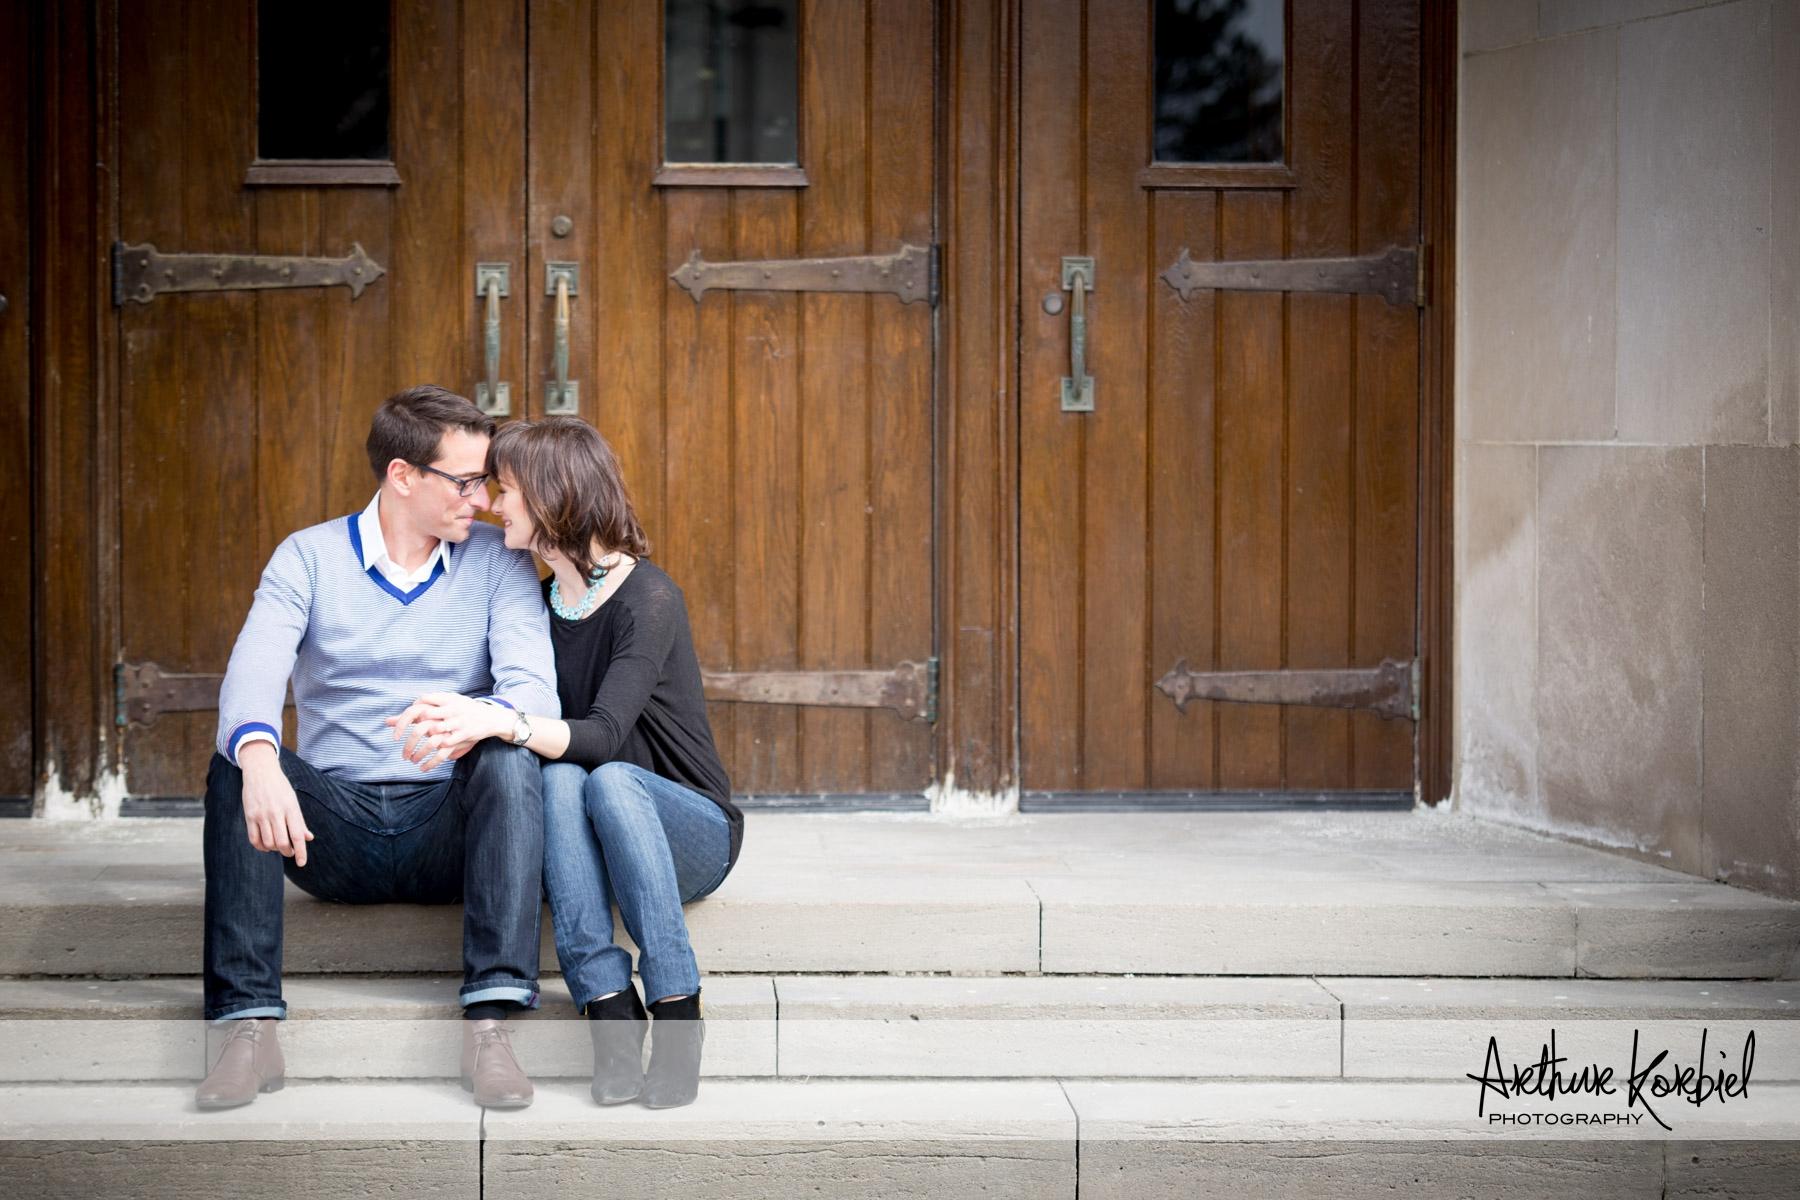 Arthur Korbiel Photography - London Engagement Photographer-012.jpg